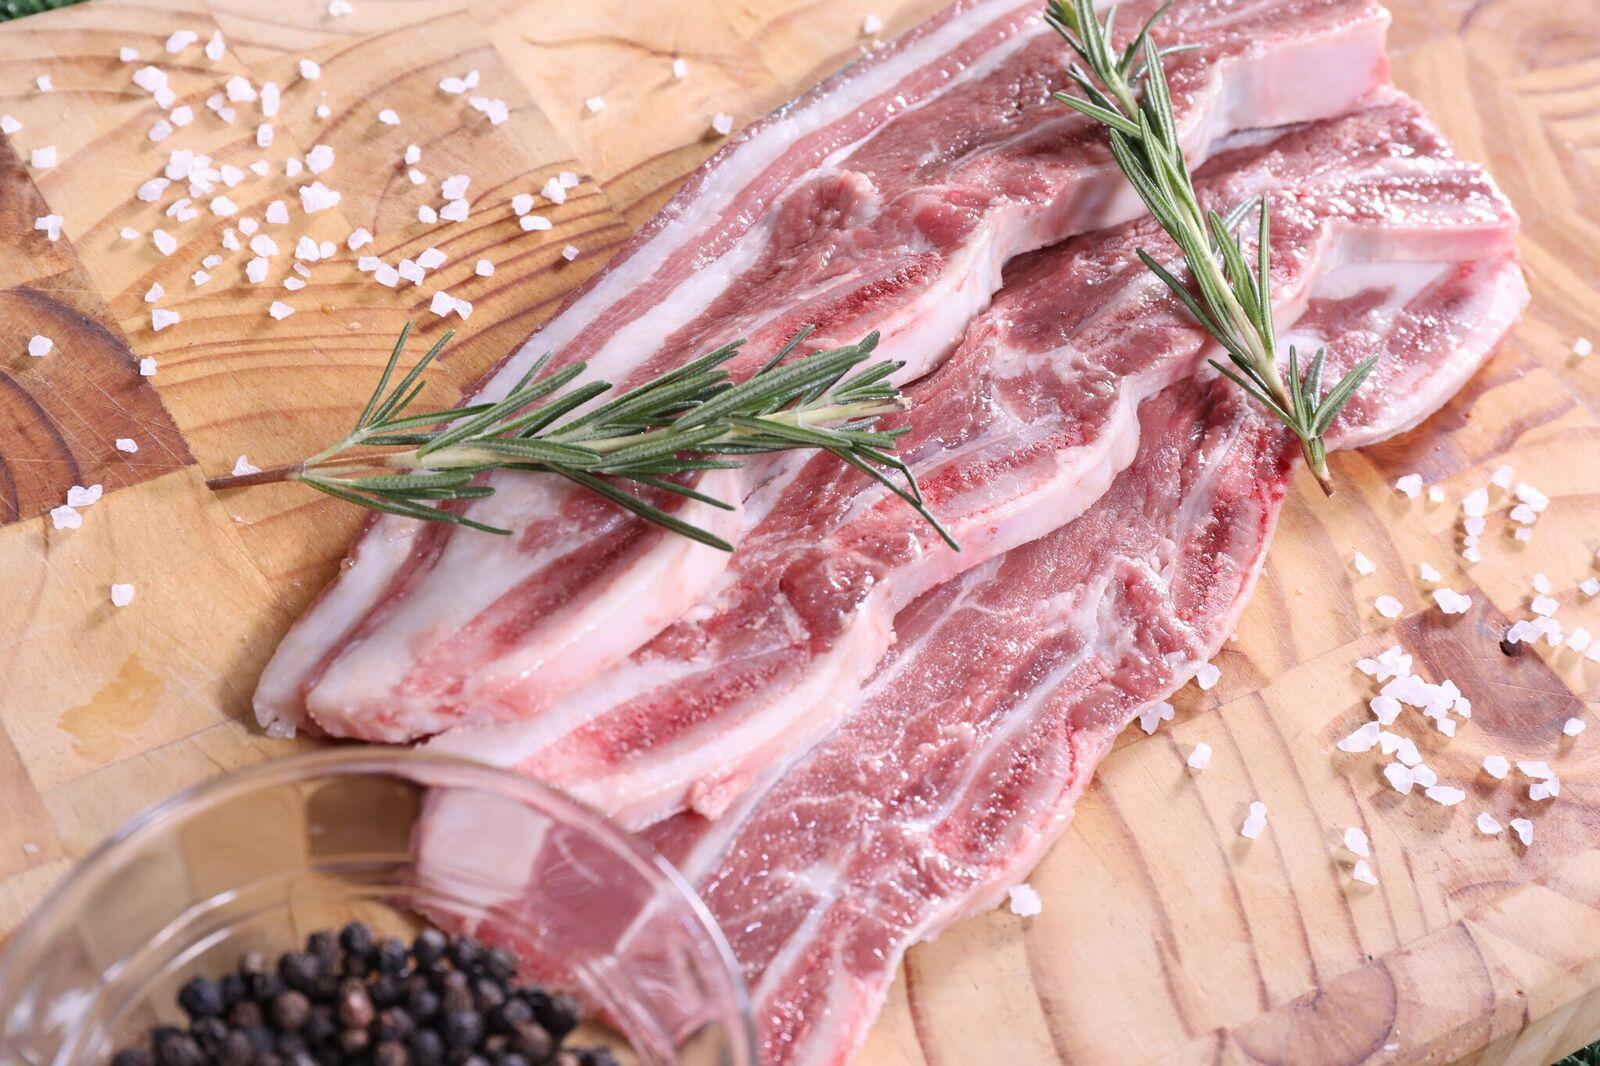 Roots Butchery | Wholesale Butchery | Retail Butchery | Nationwide